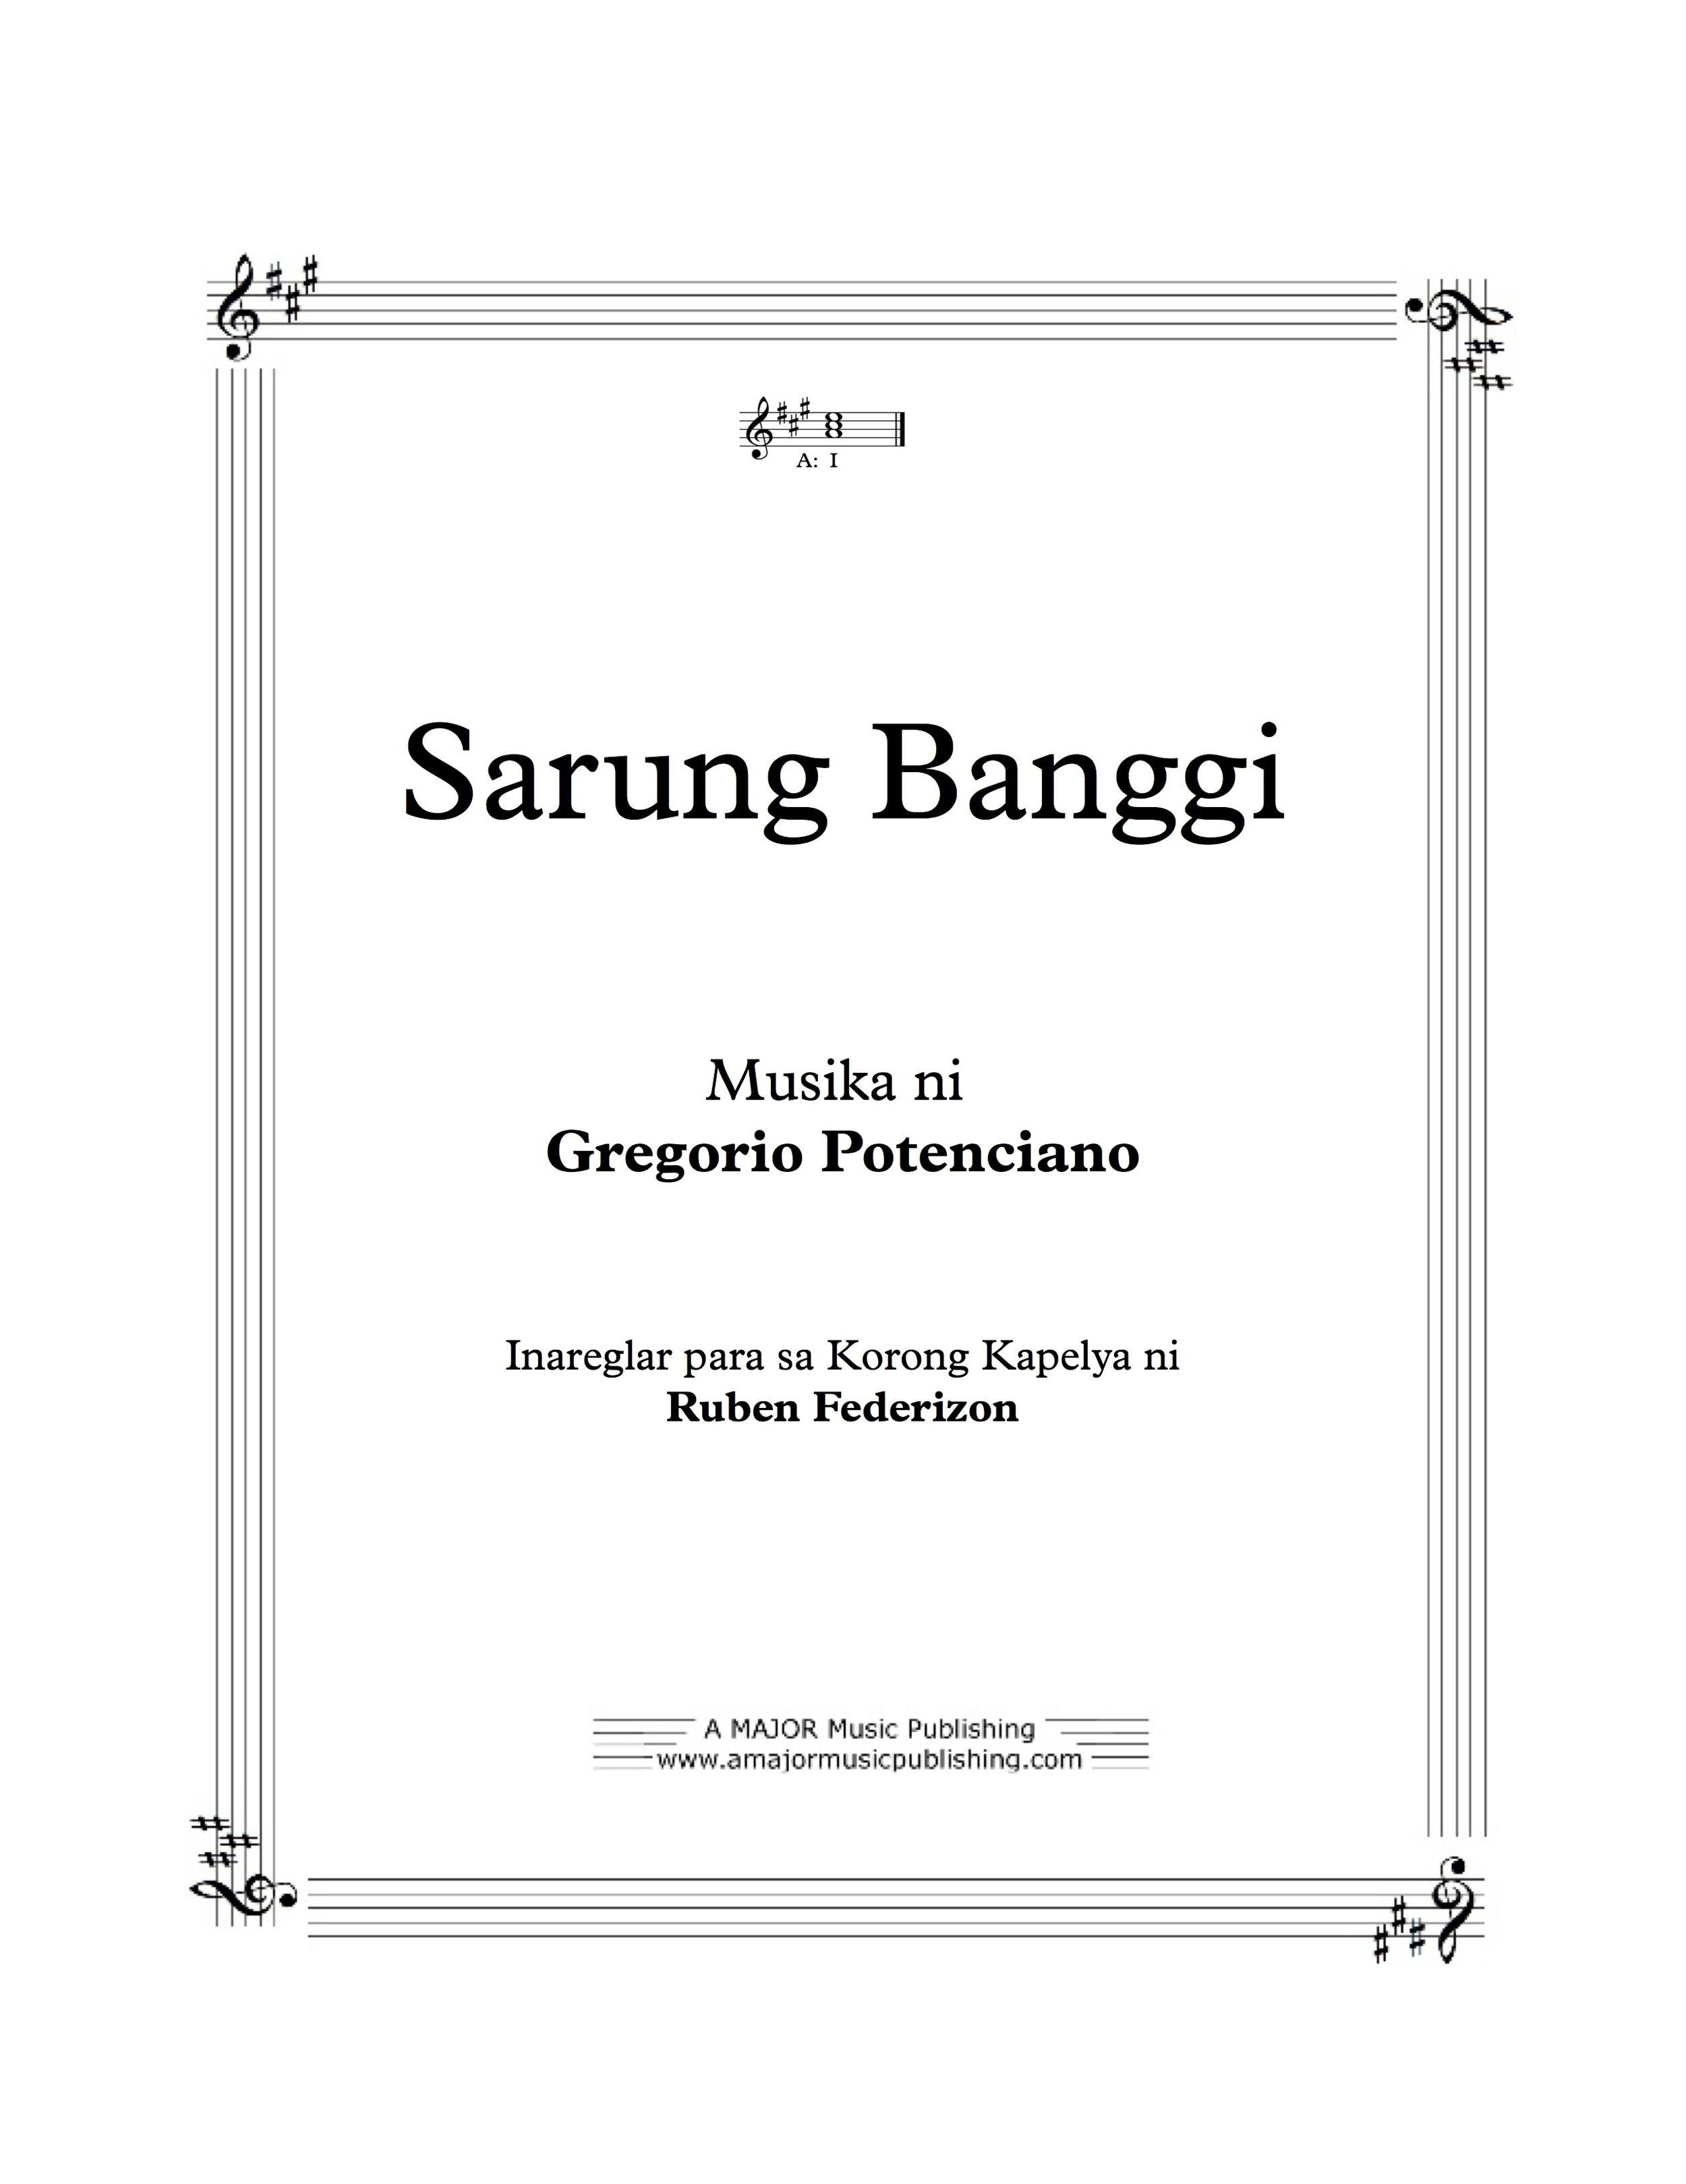 Cover5-Sarung Bangui07***.jpg